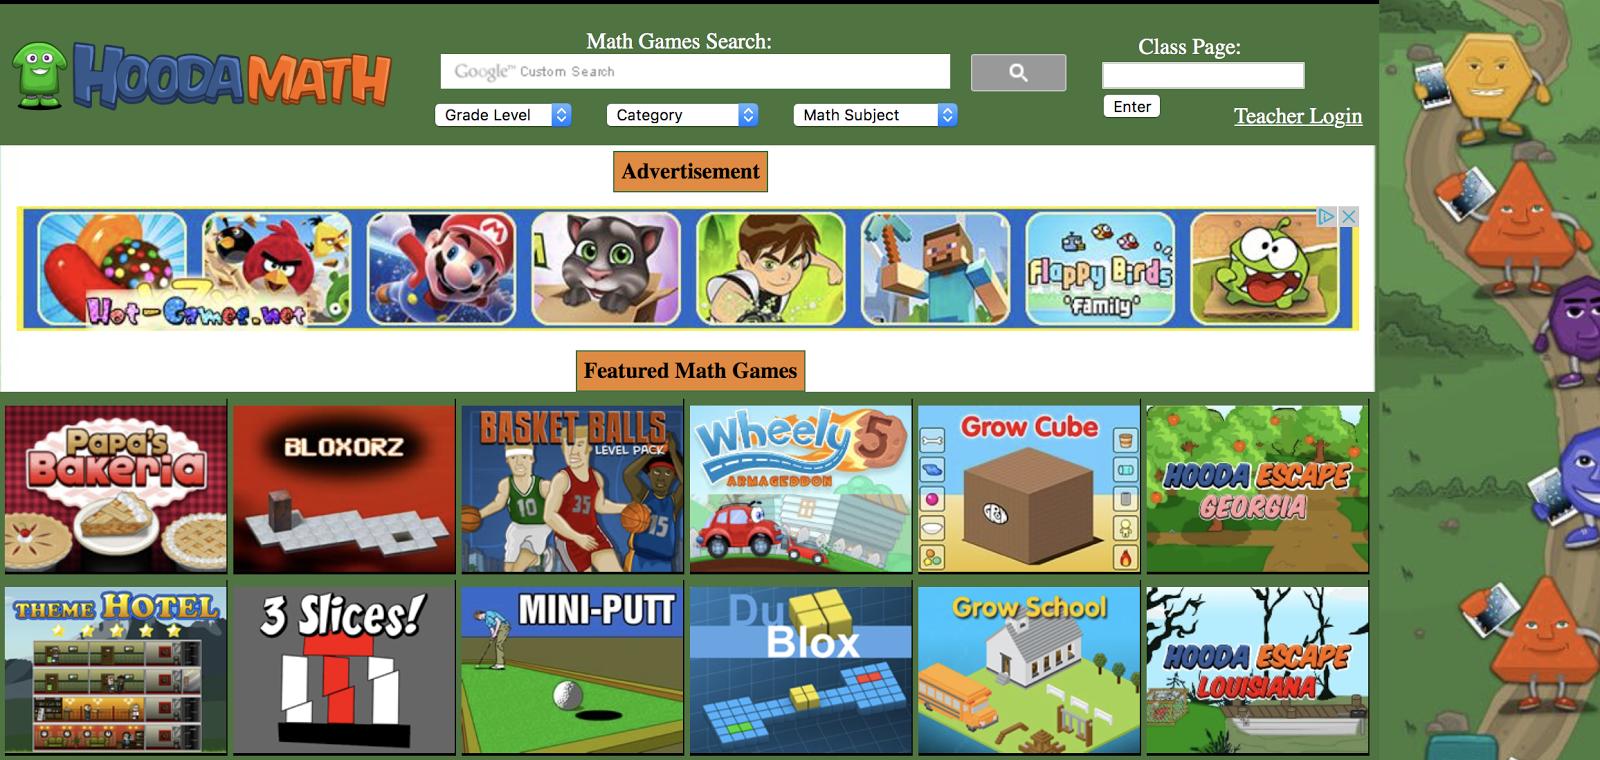 Dragon S Den Curriculum 10 Simply Amazing Math Websites